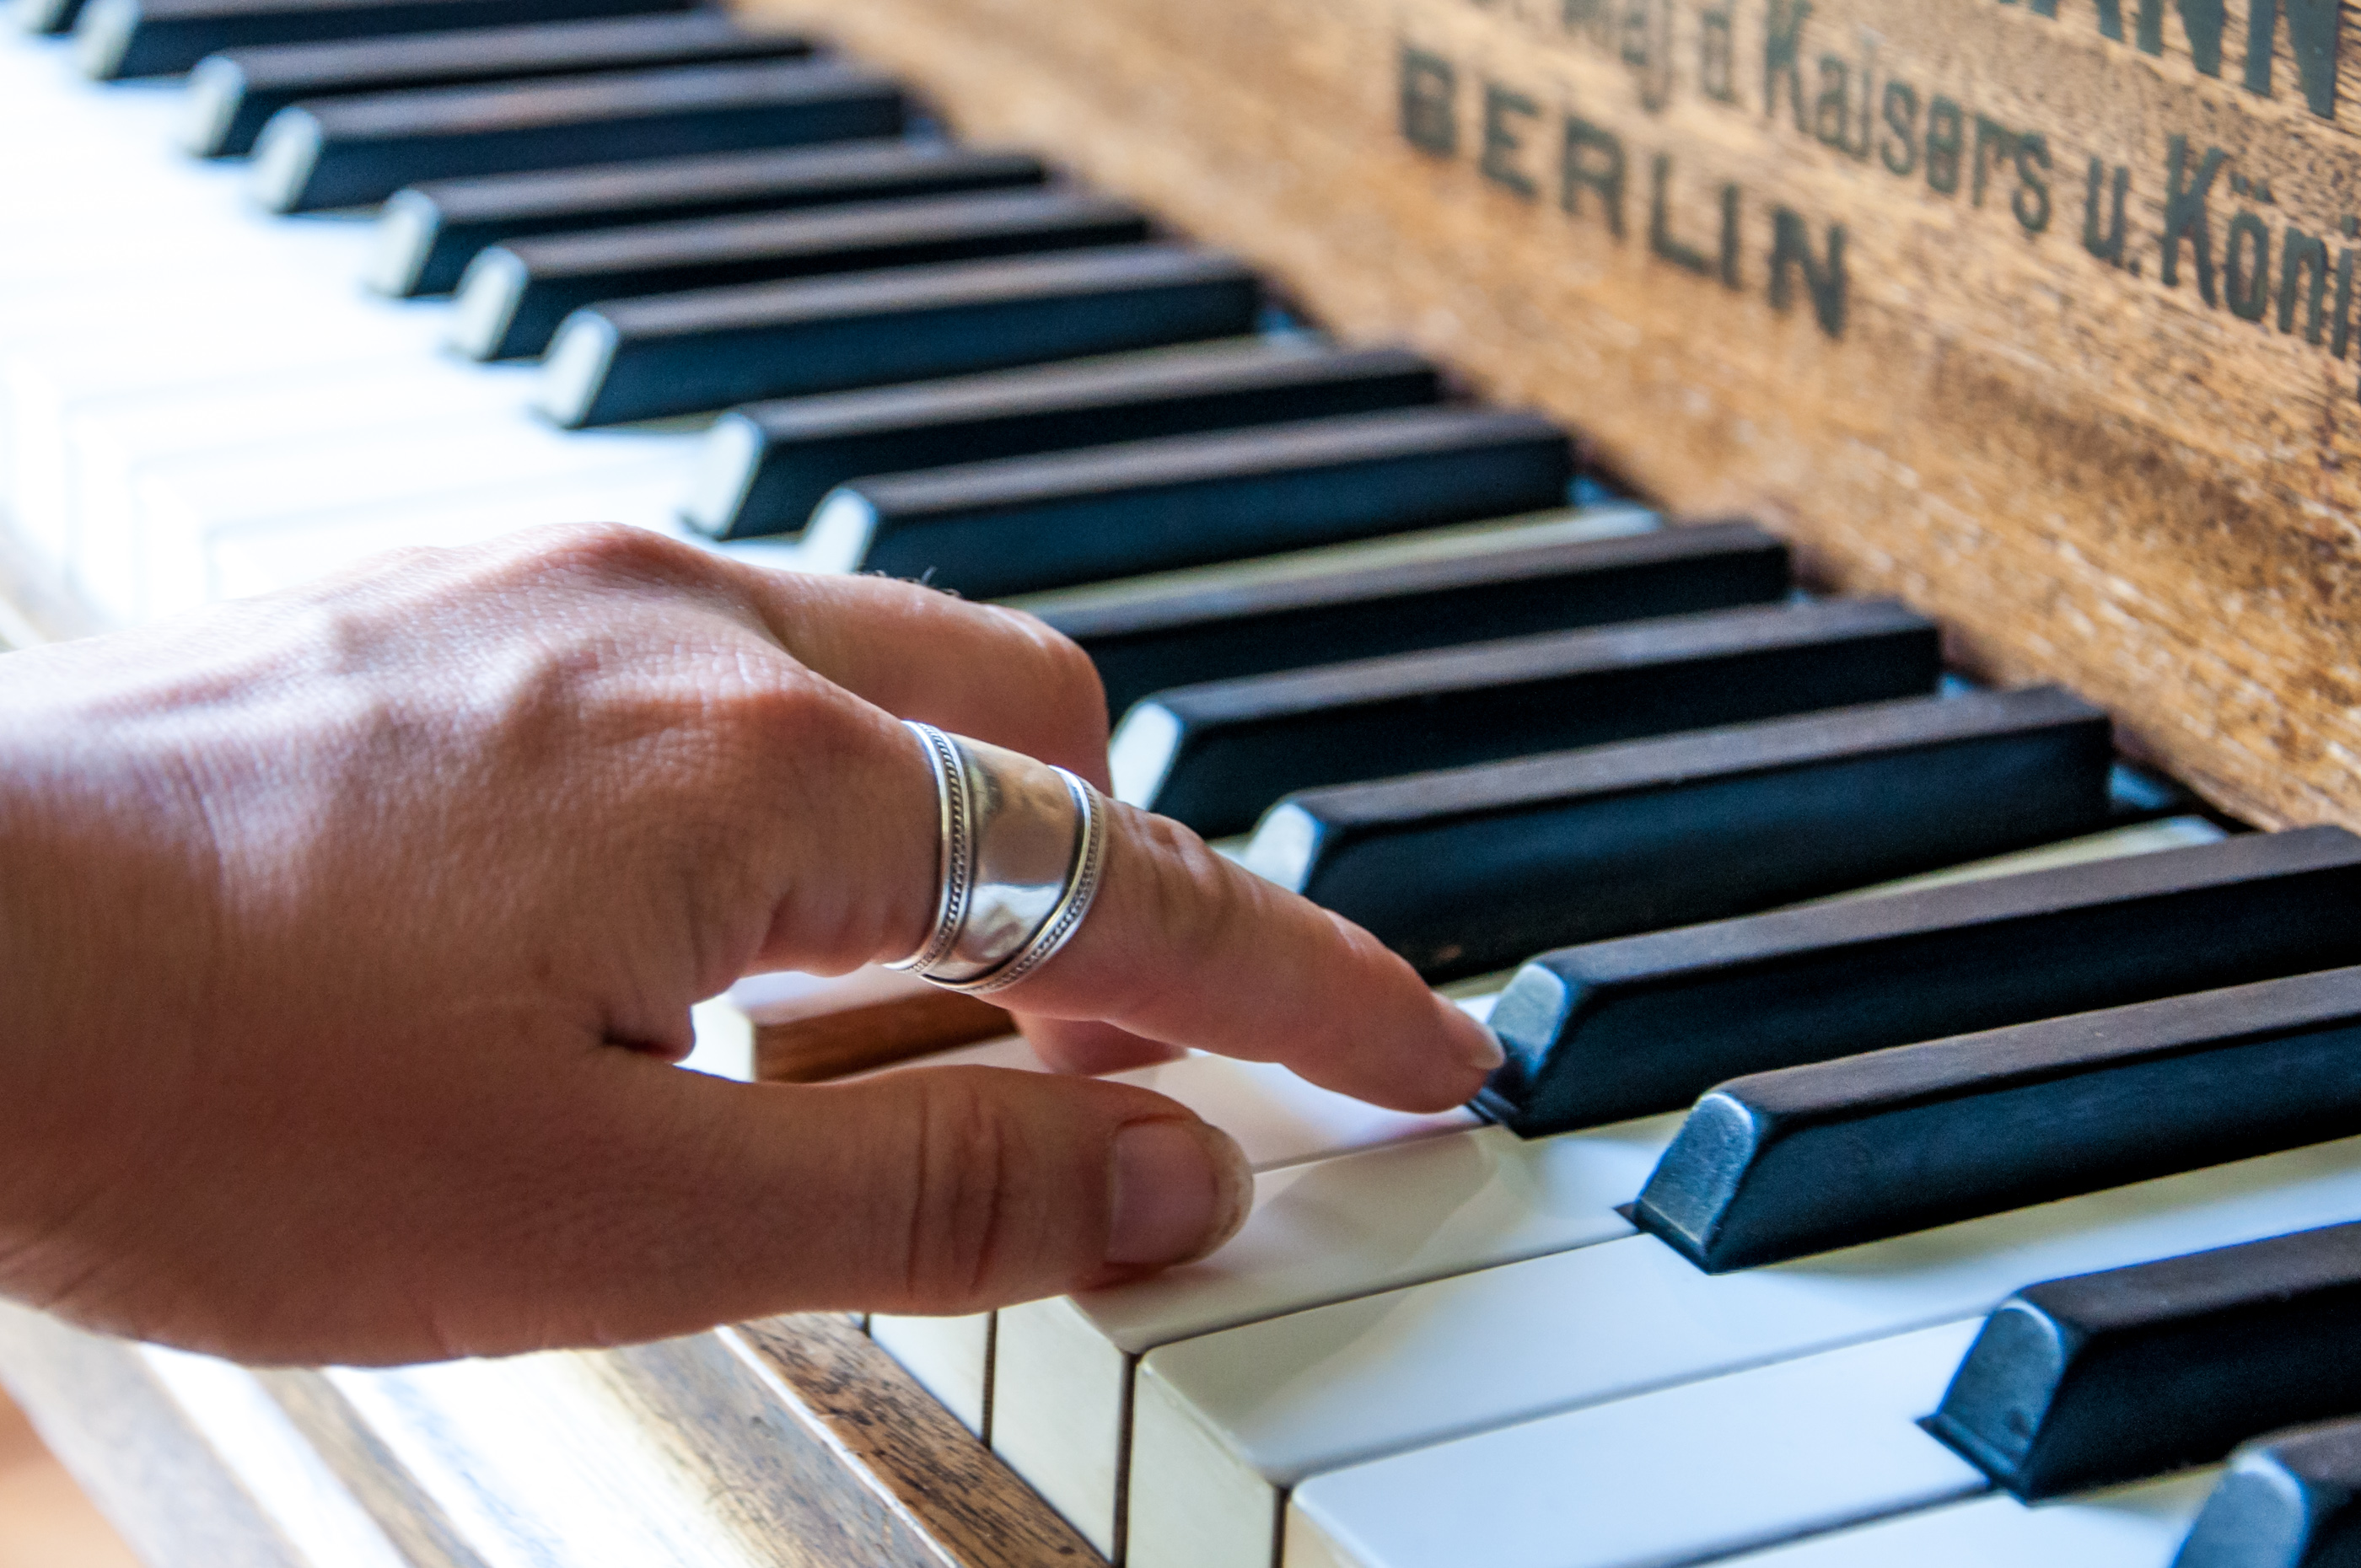 Piano player photo